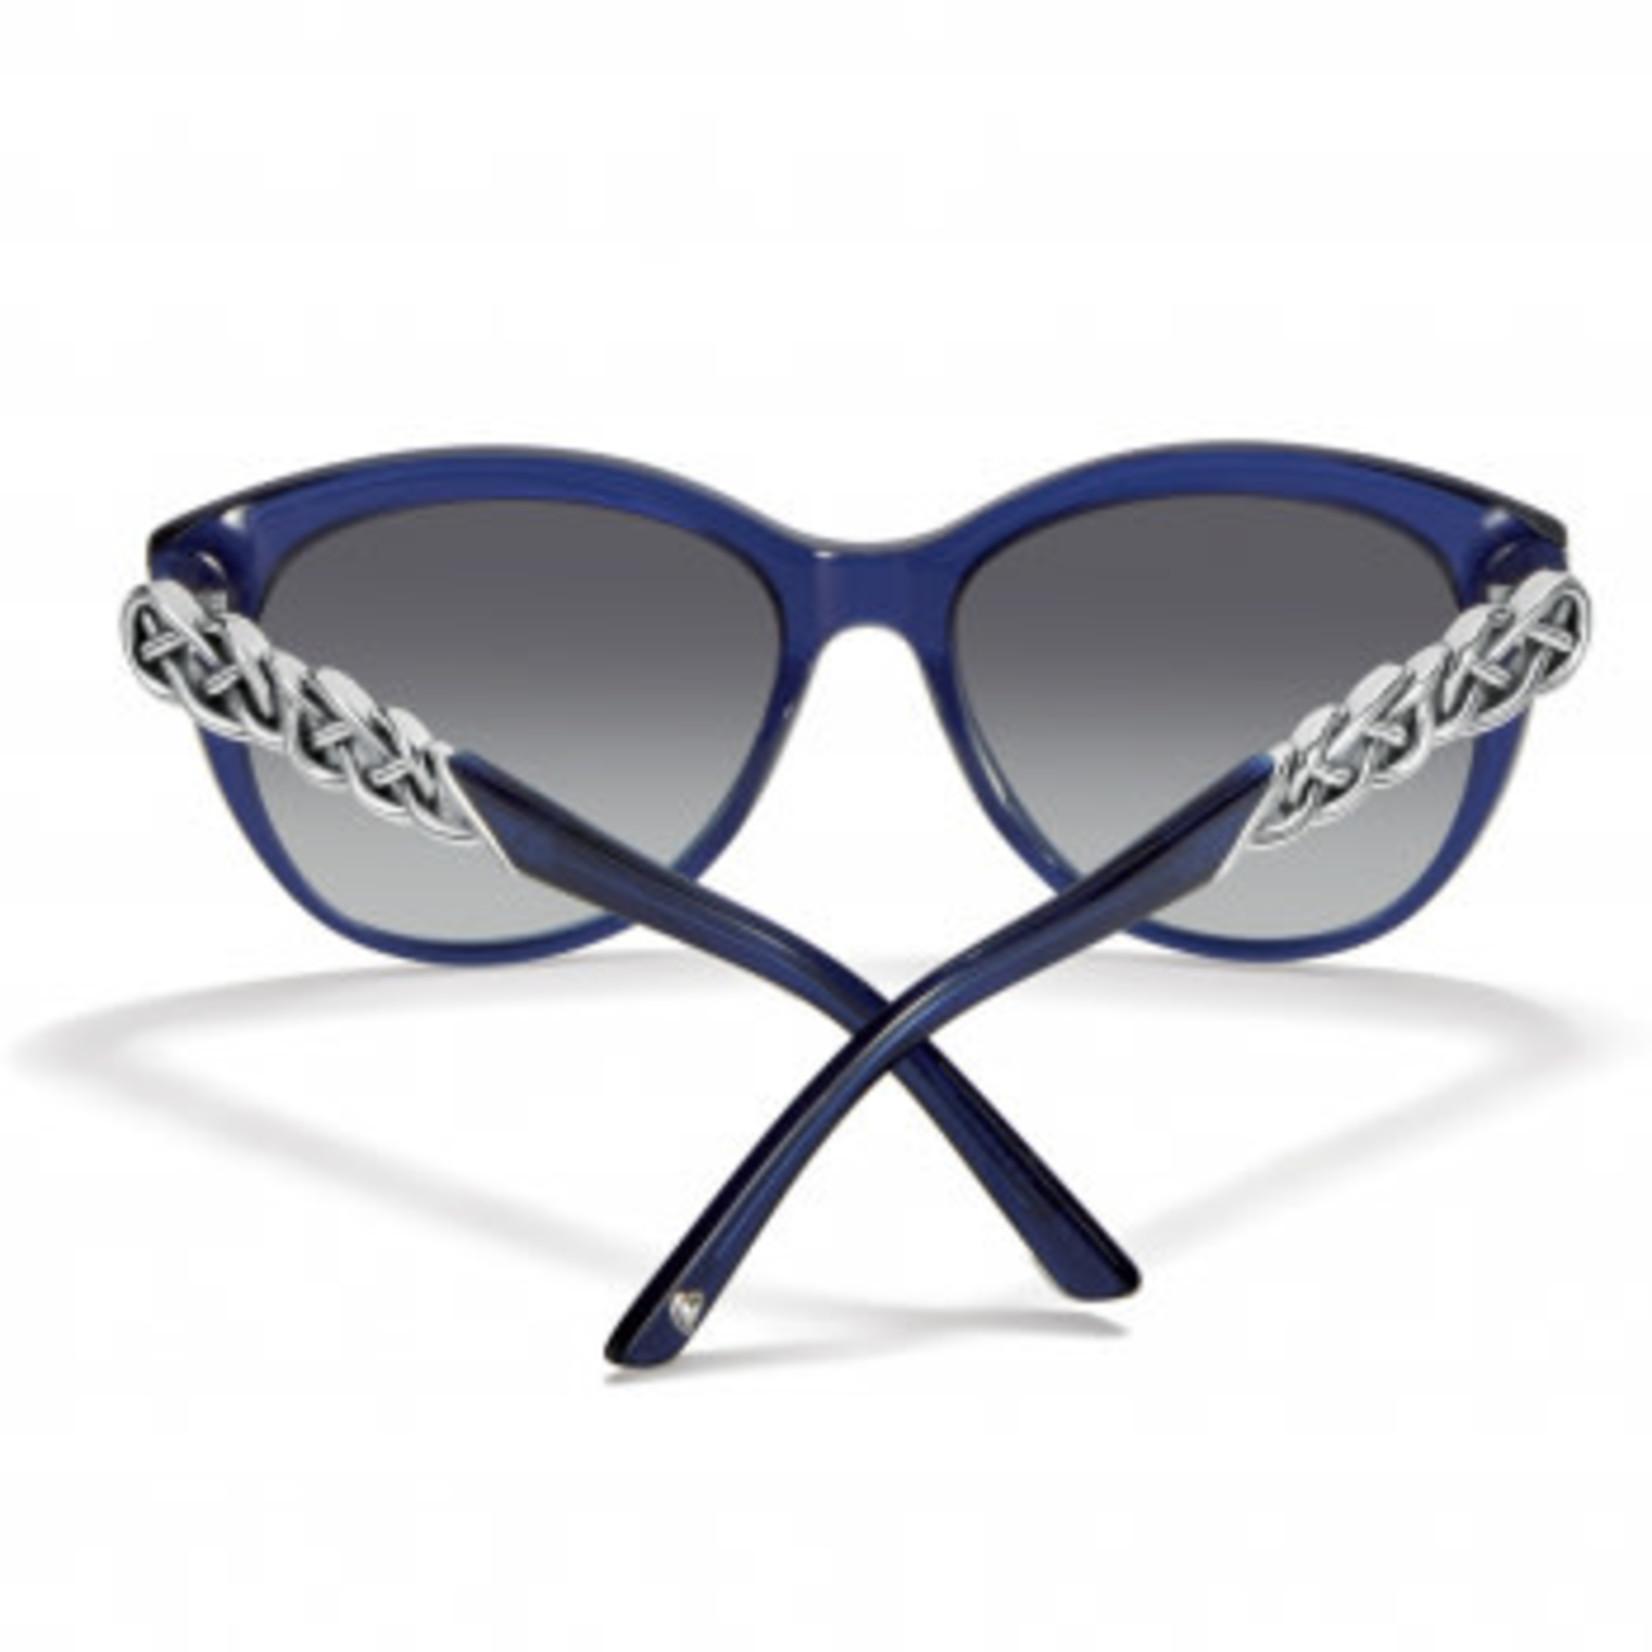 Brighton Interlok Braid Sunglasses in Navy